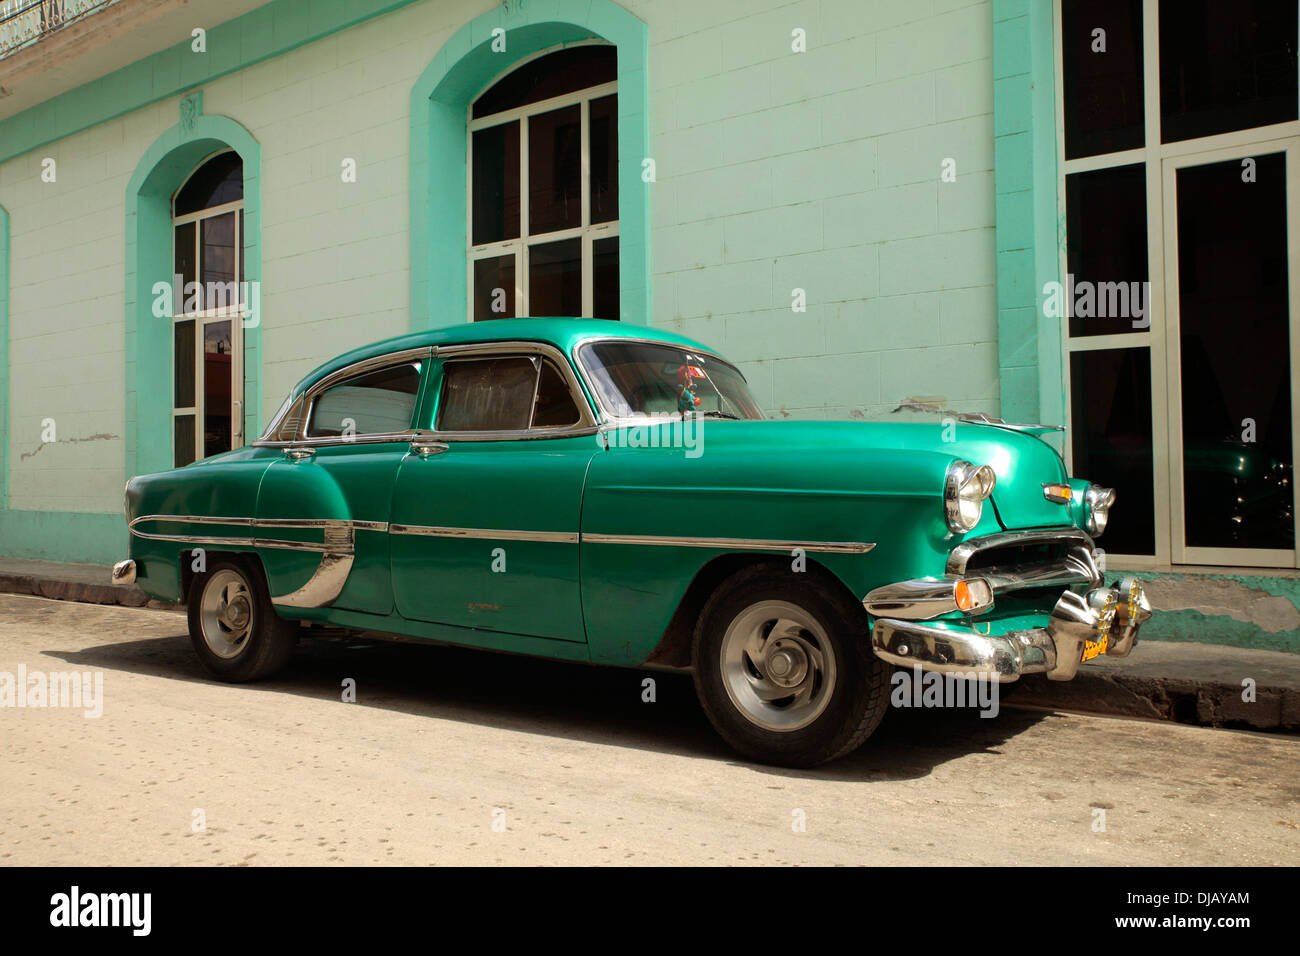 Oldtimer, amerikanische Oldtimer, Camagüey, Kuba Stockbild